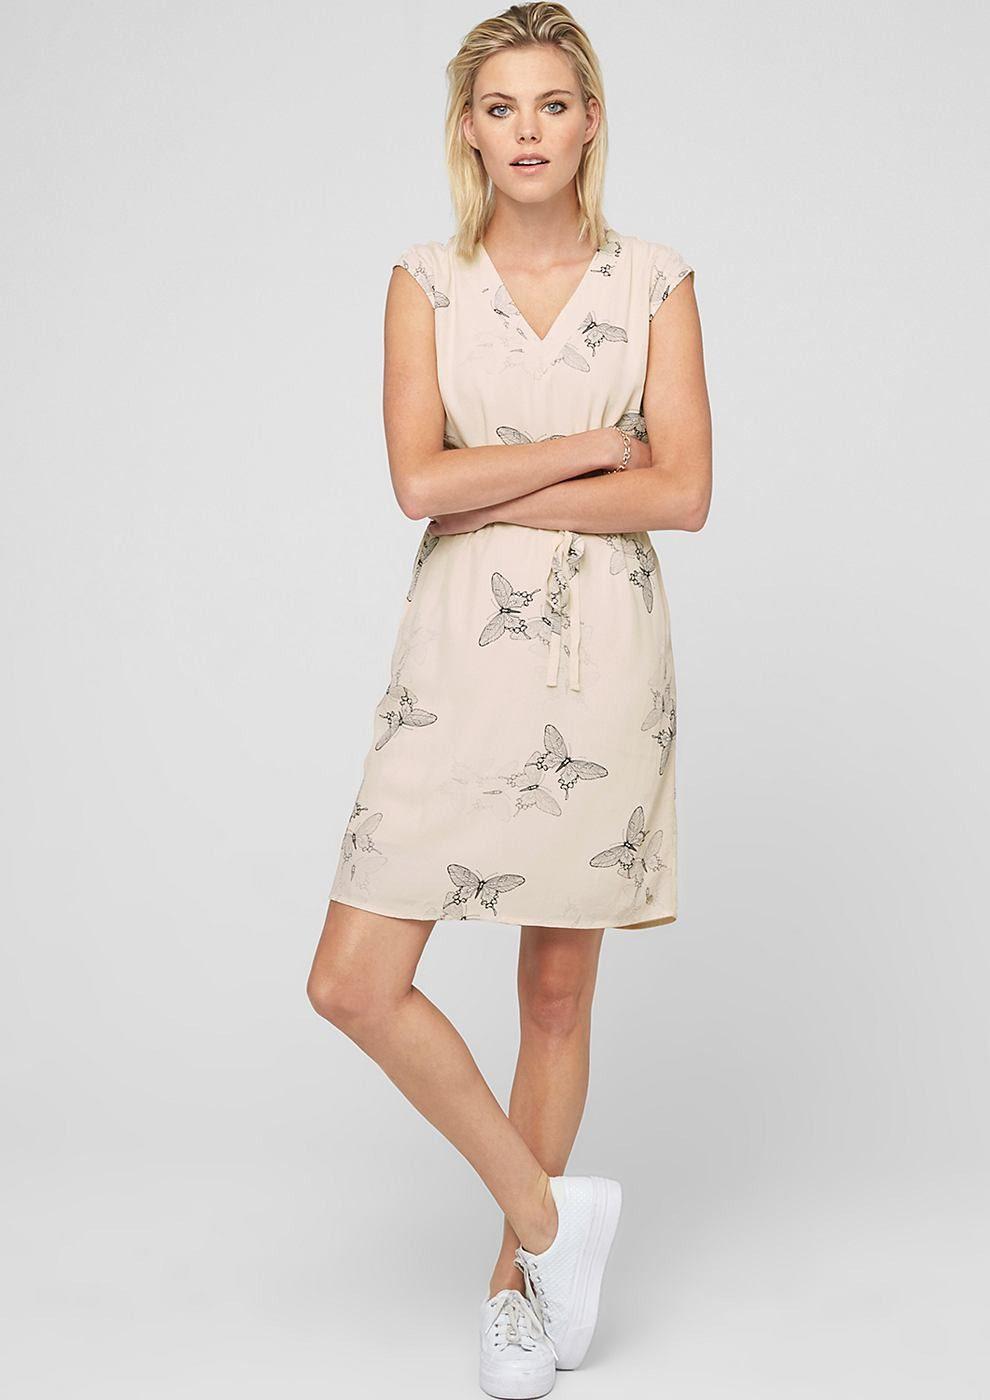 Soliver Sommerkleid Mit Musterprint Weiß  Sommerkleid